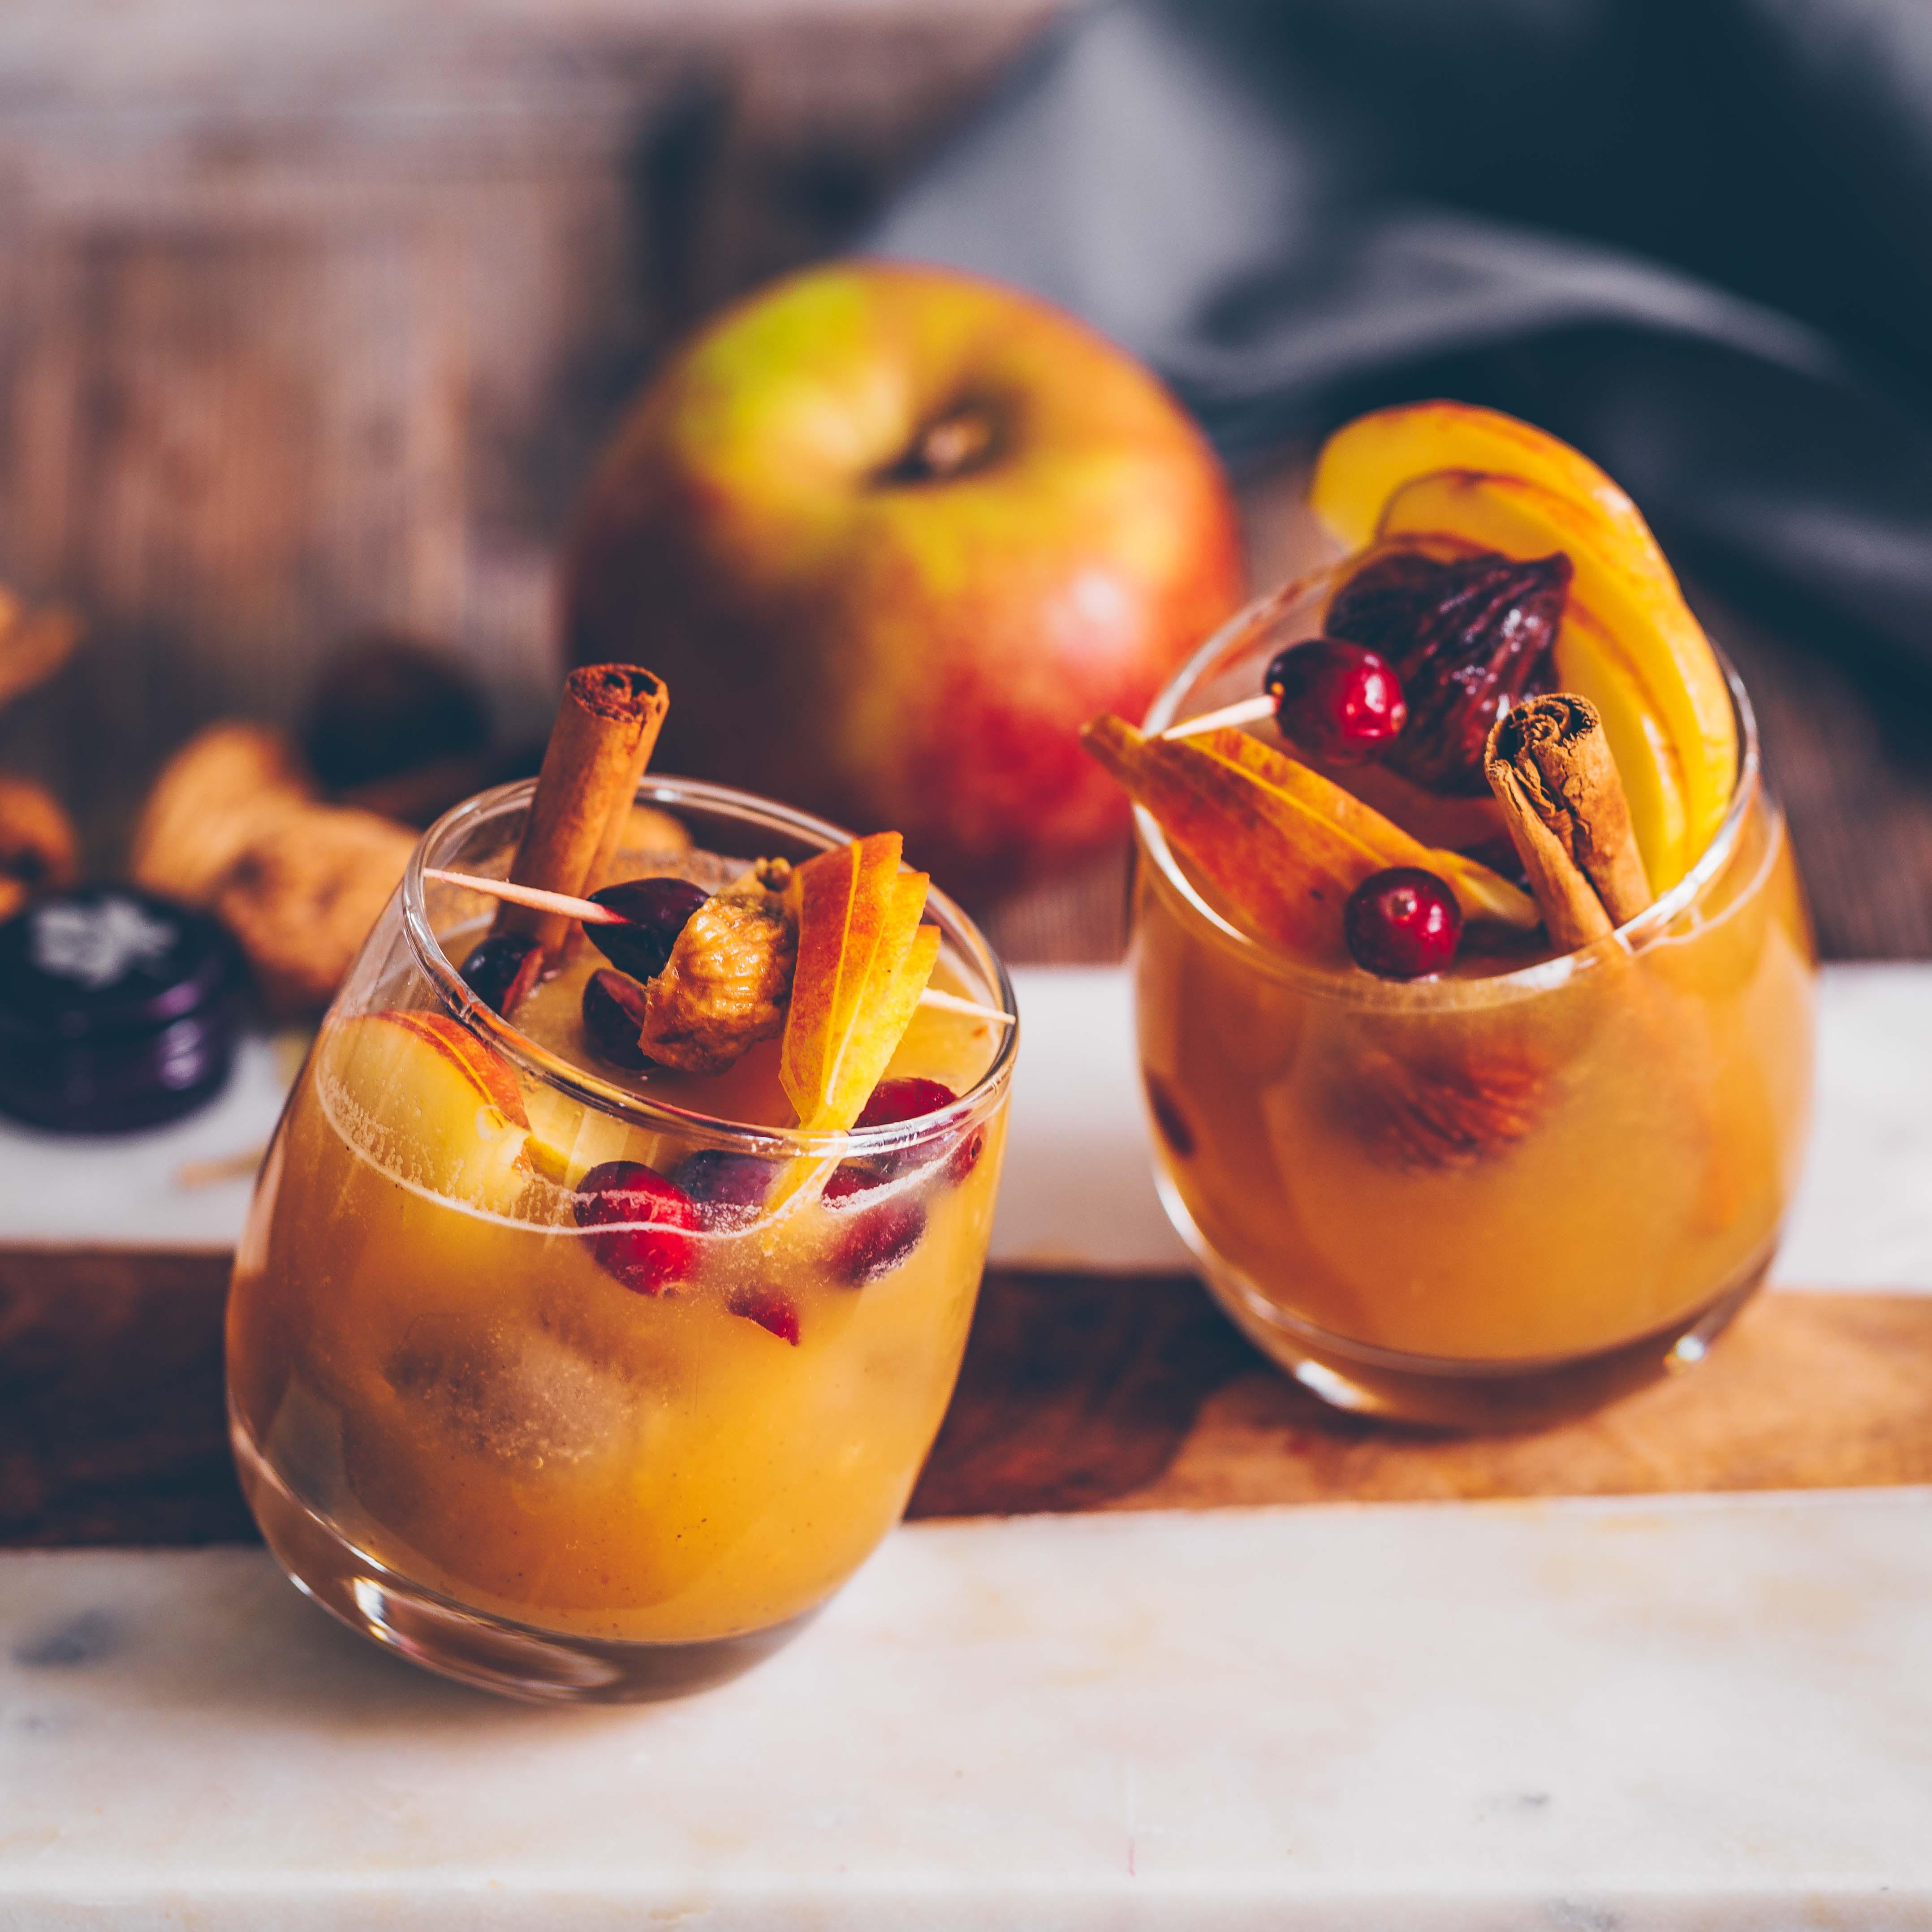 Apfel Feigen Cocktail